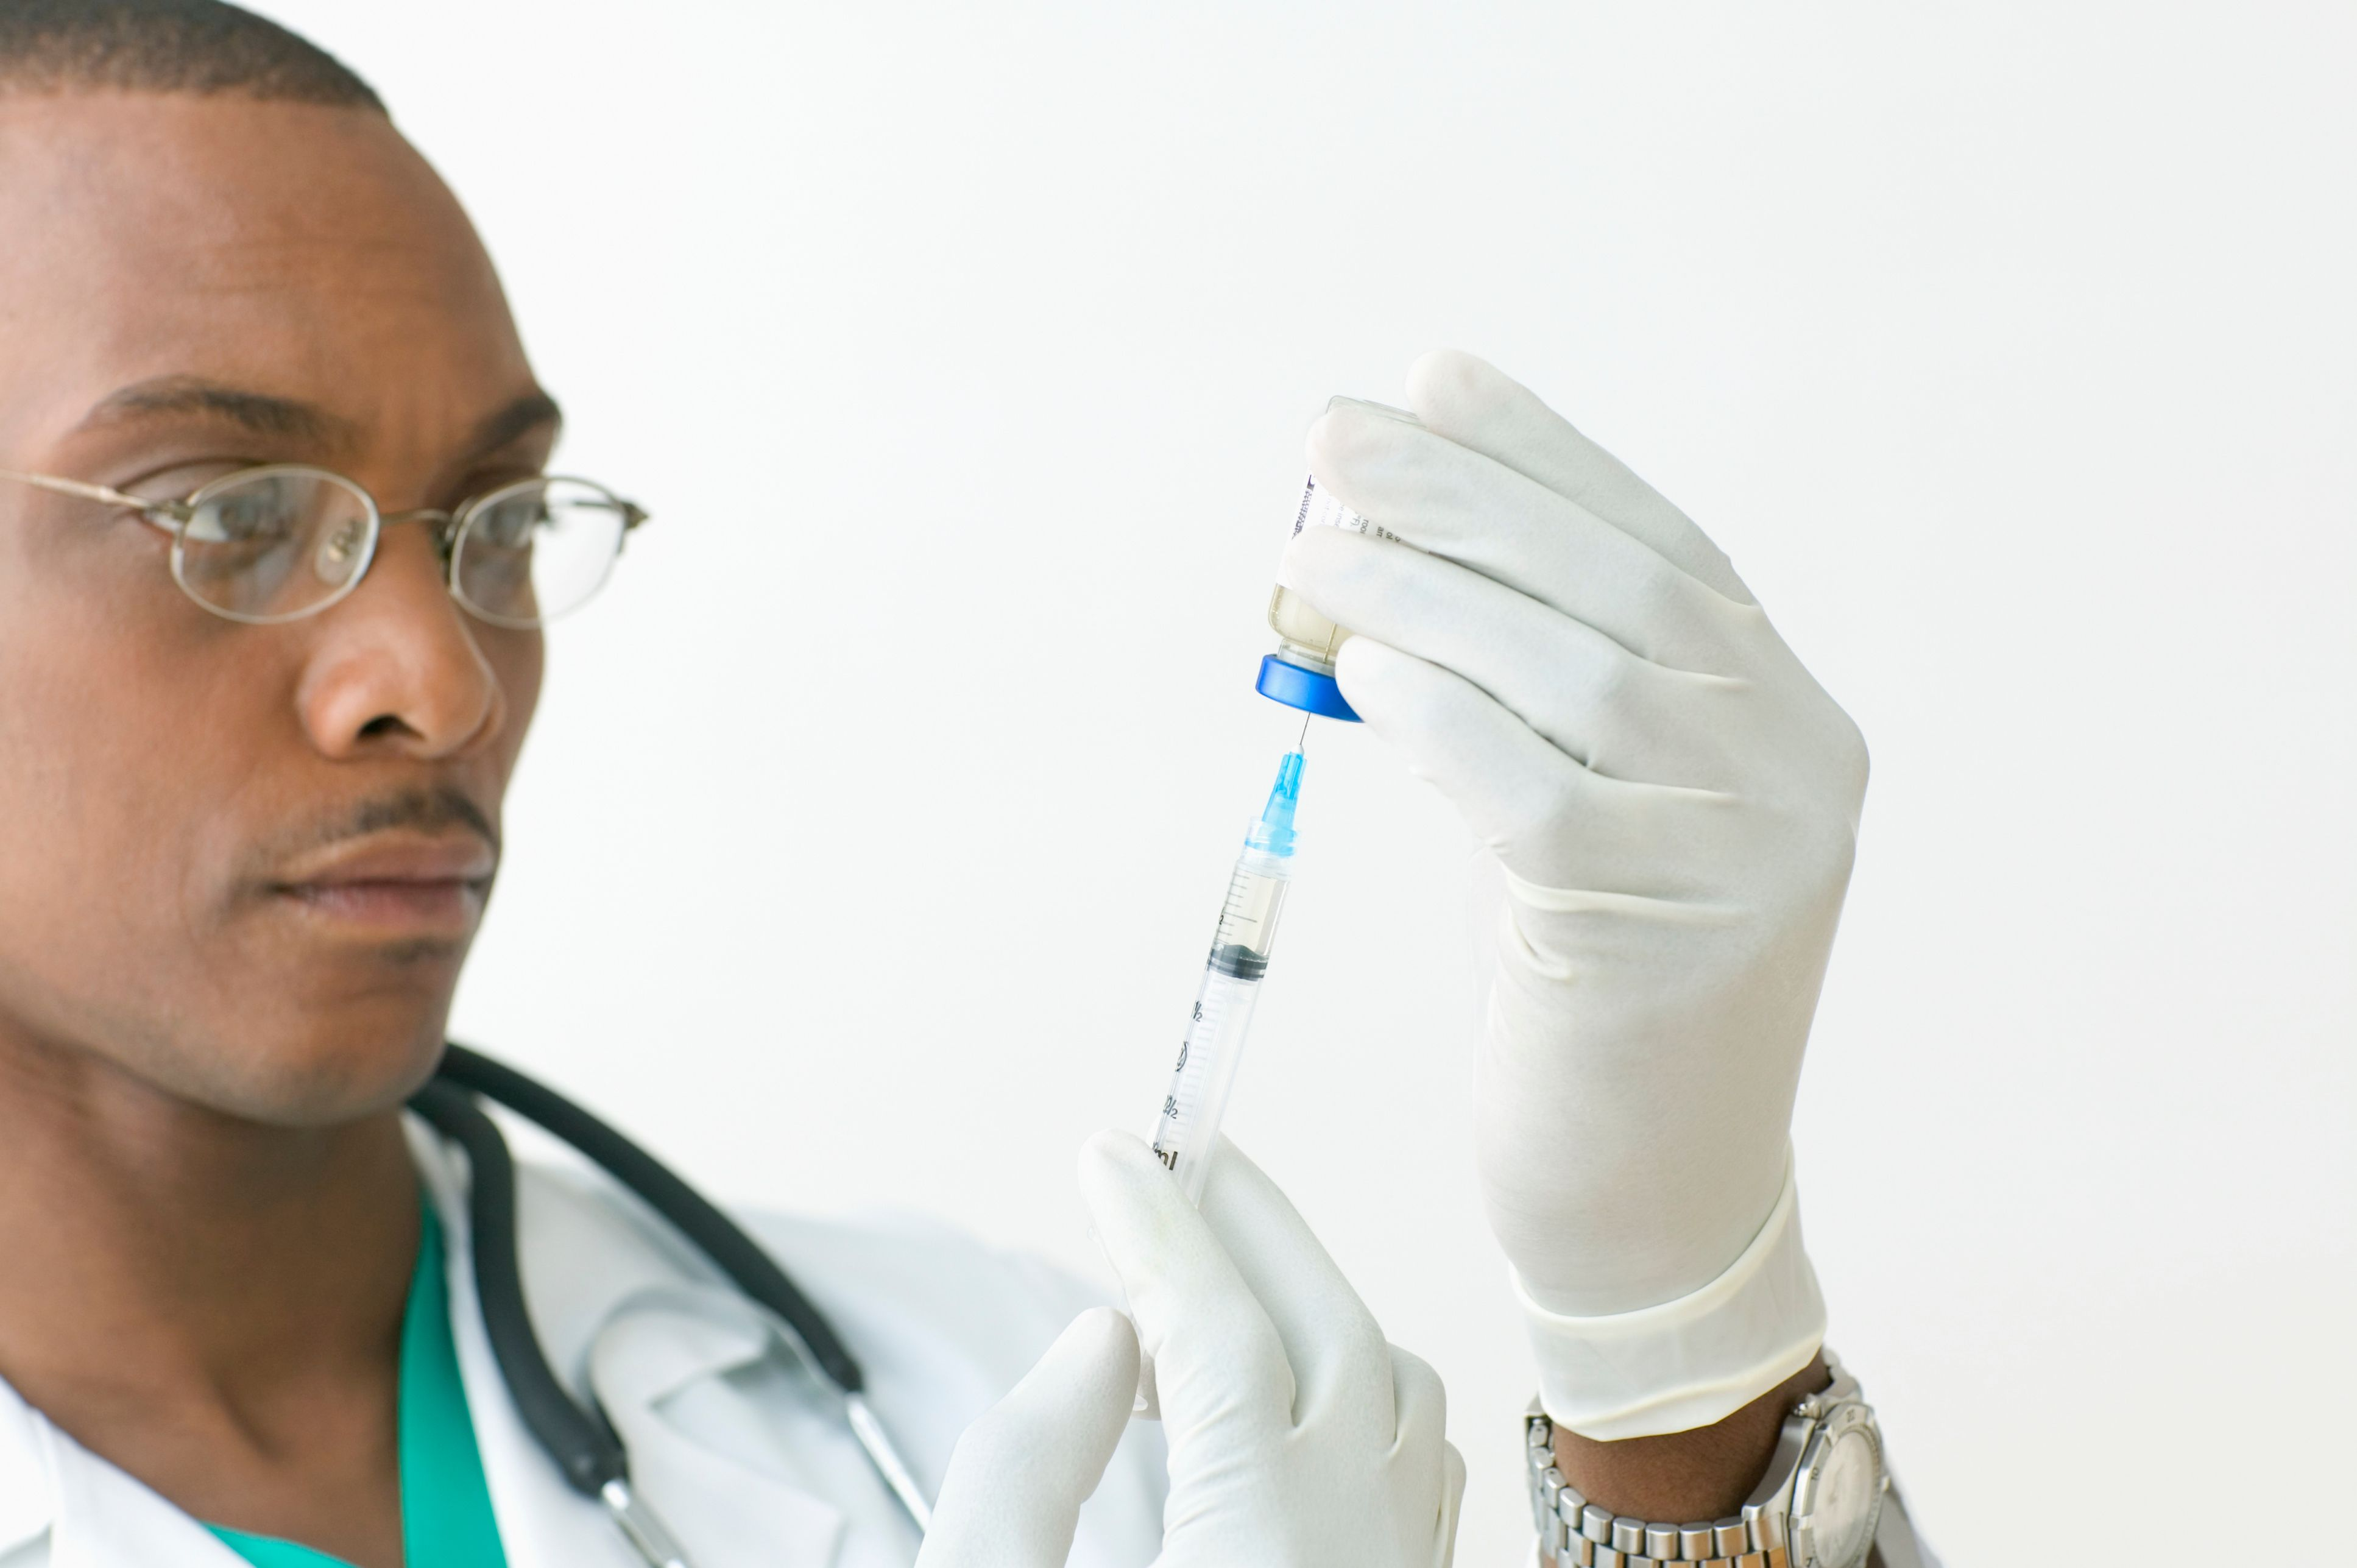 A doctor loads a vaccine